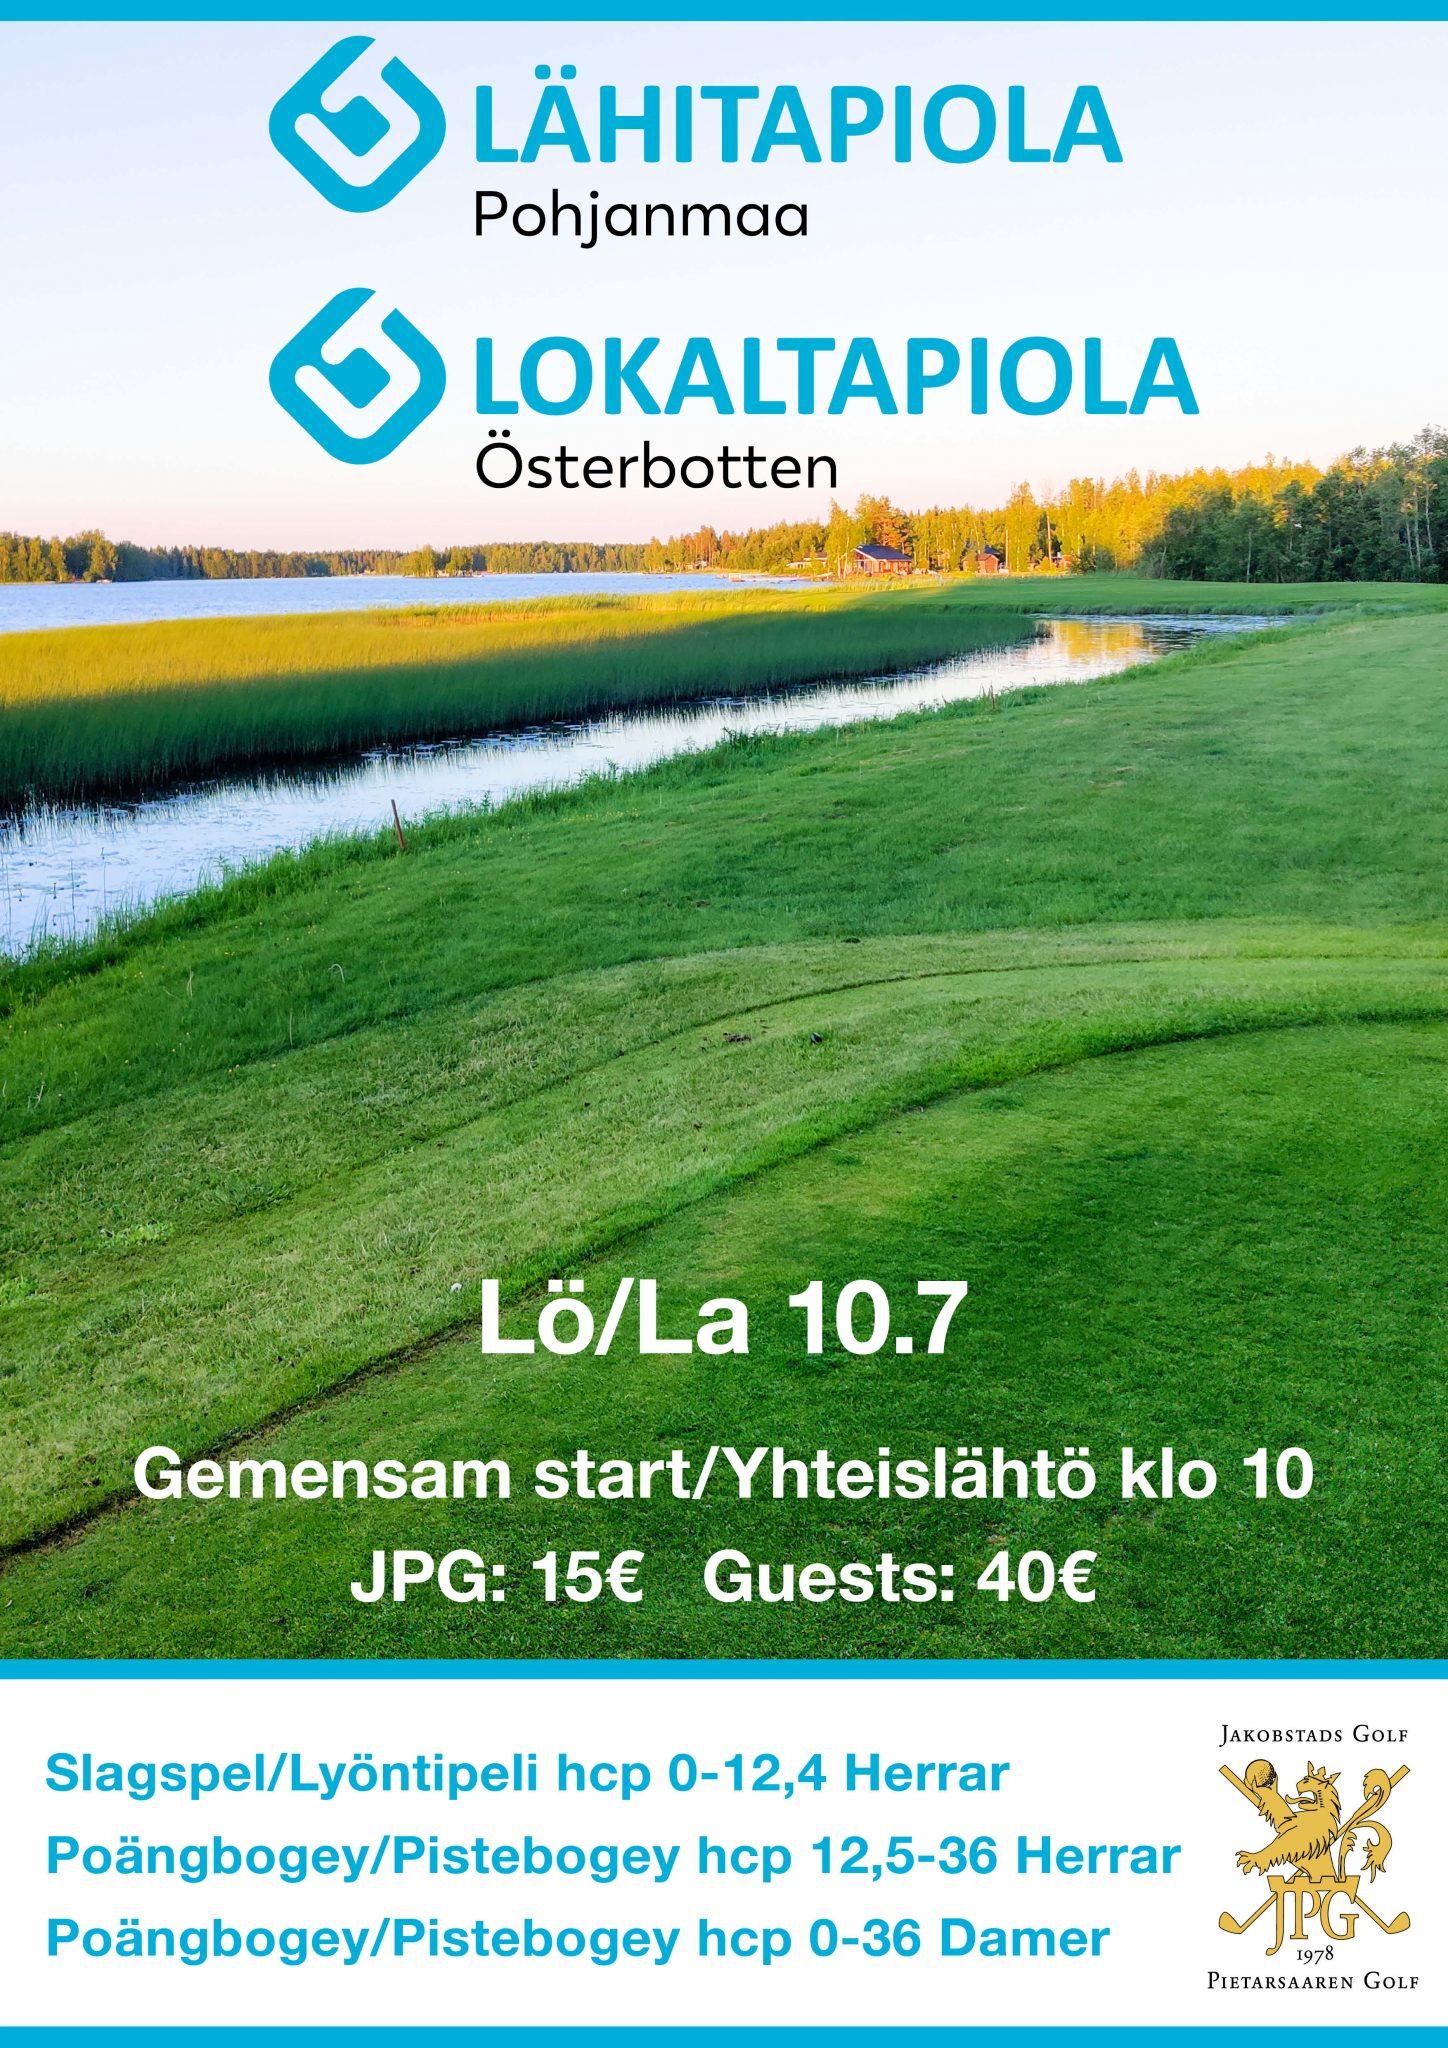 LokalTapiola Open